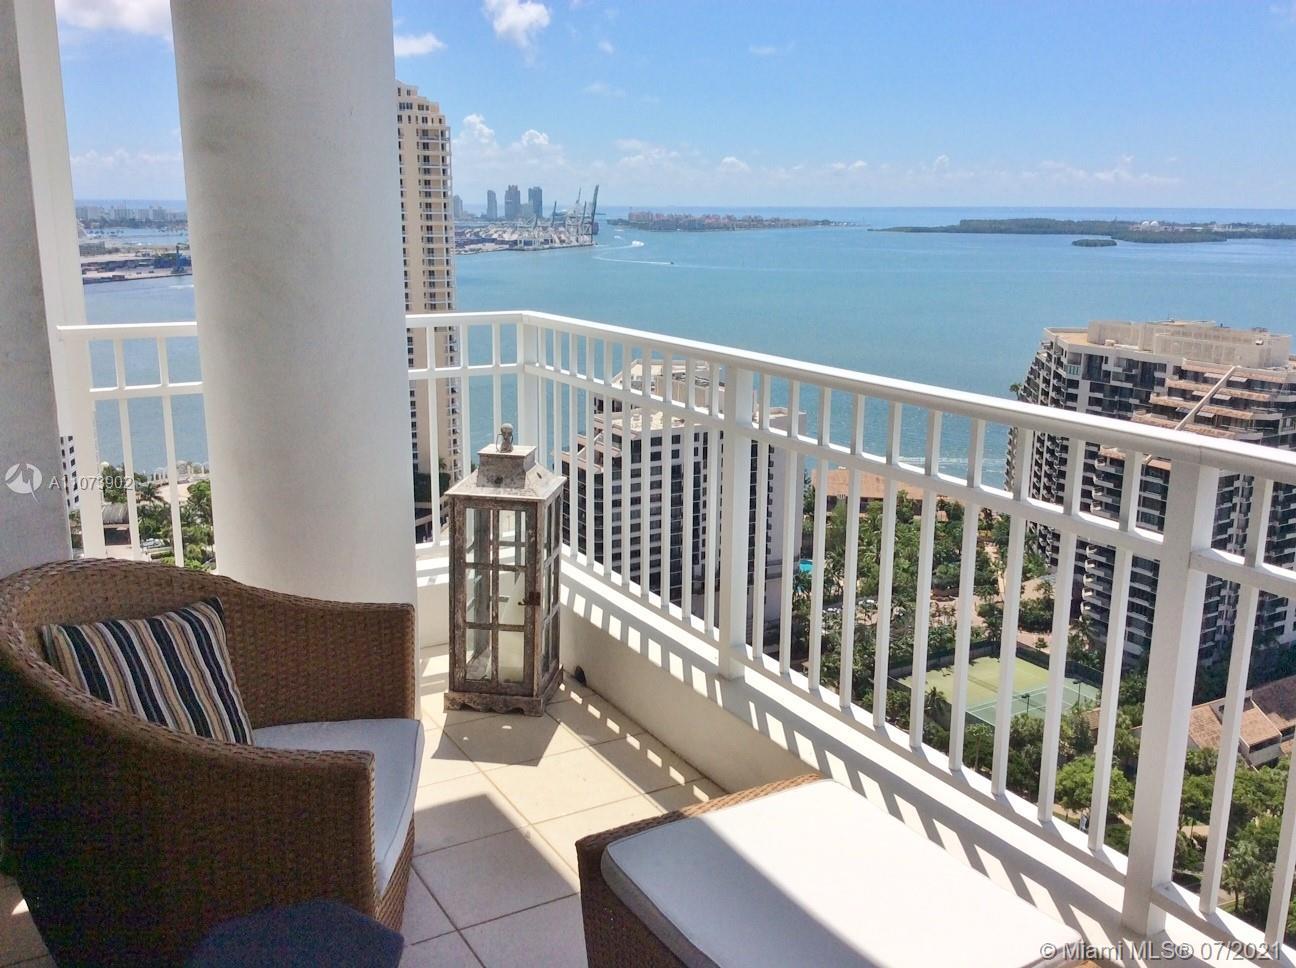 Courts Brickell Key #3207 - 801 Brickell Key Blvd #3207, Miami, FL 33131